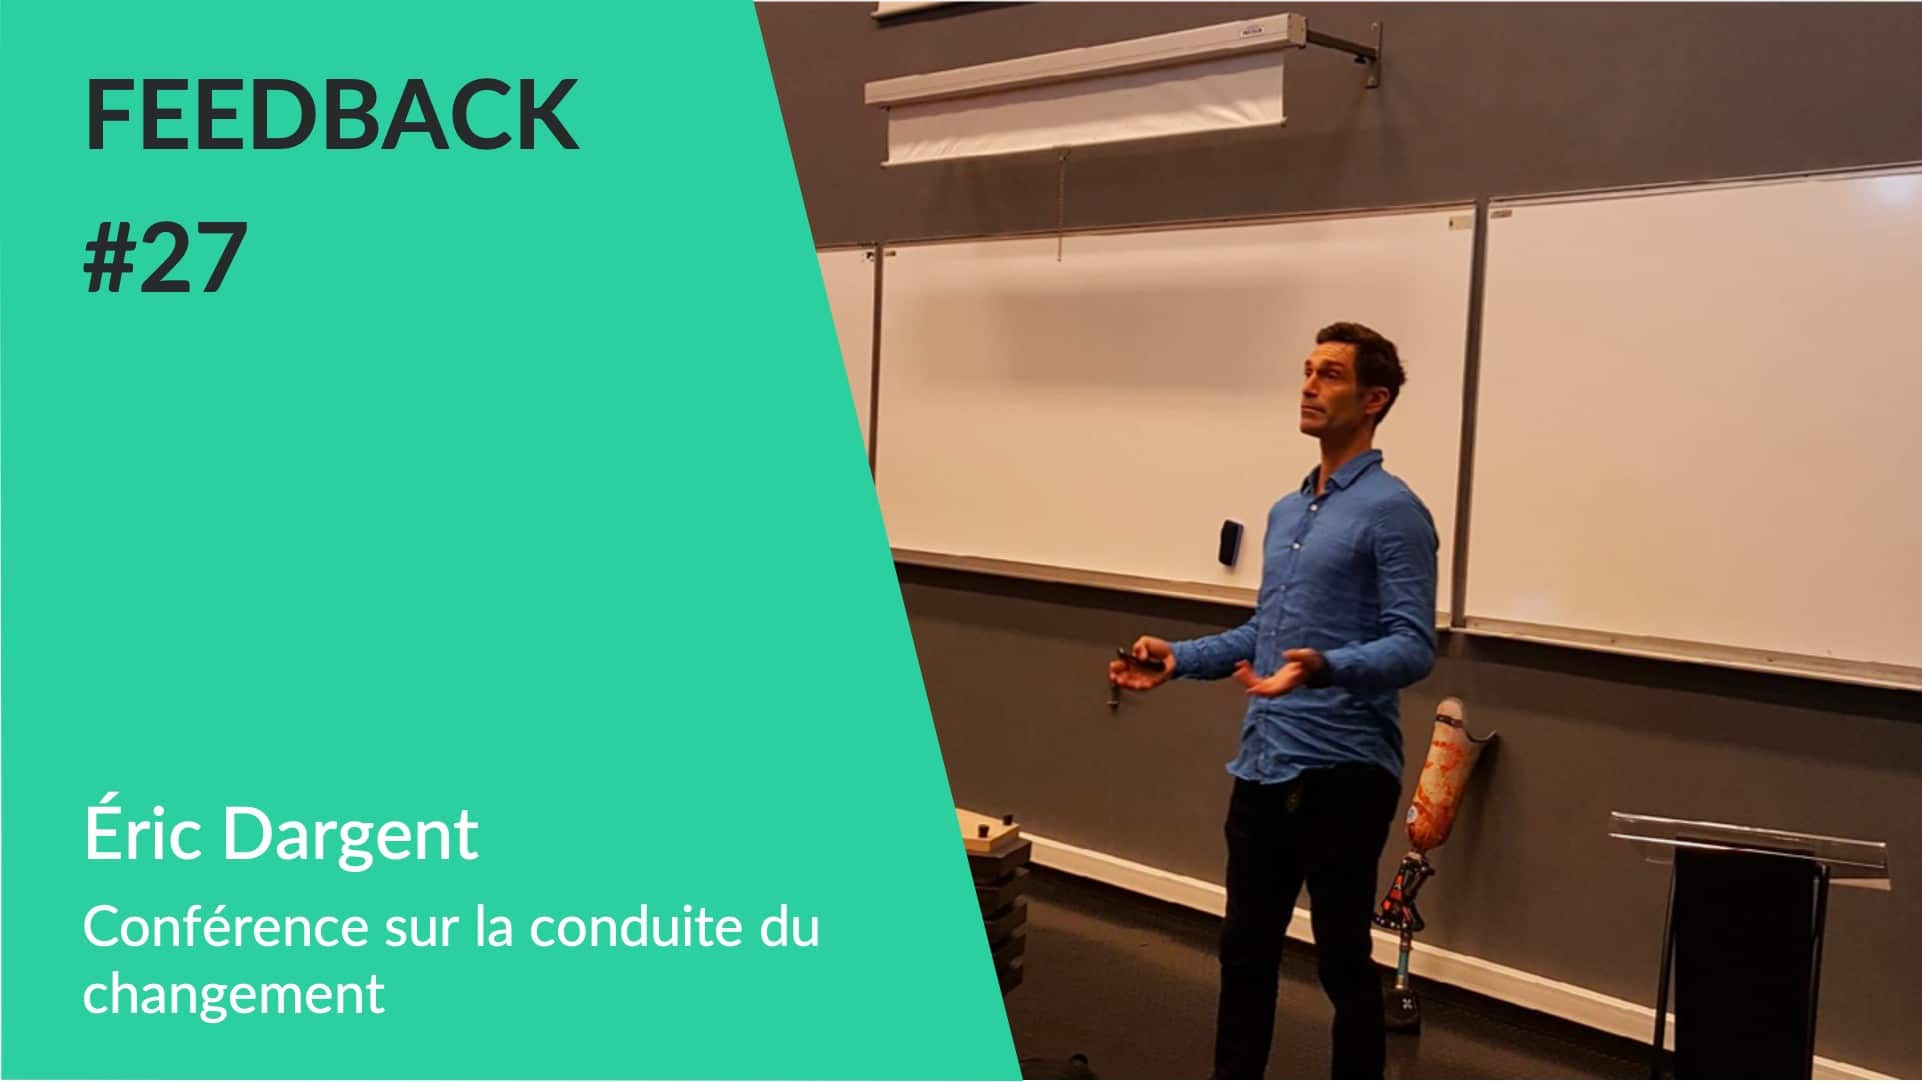 Feedback - Conférence conduite du changement Eric Dargent